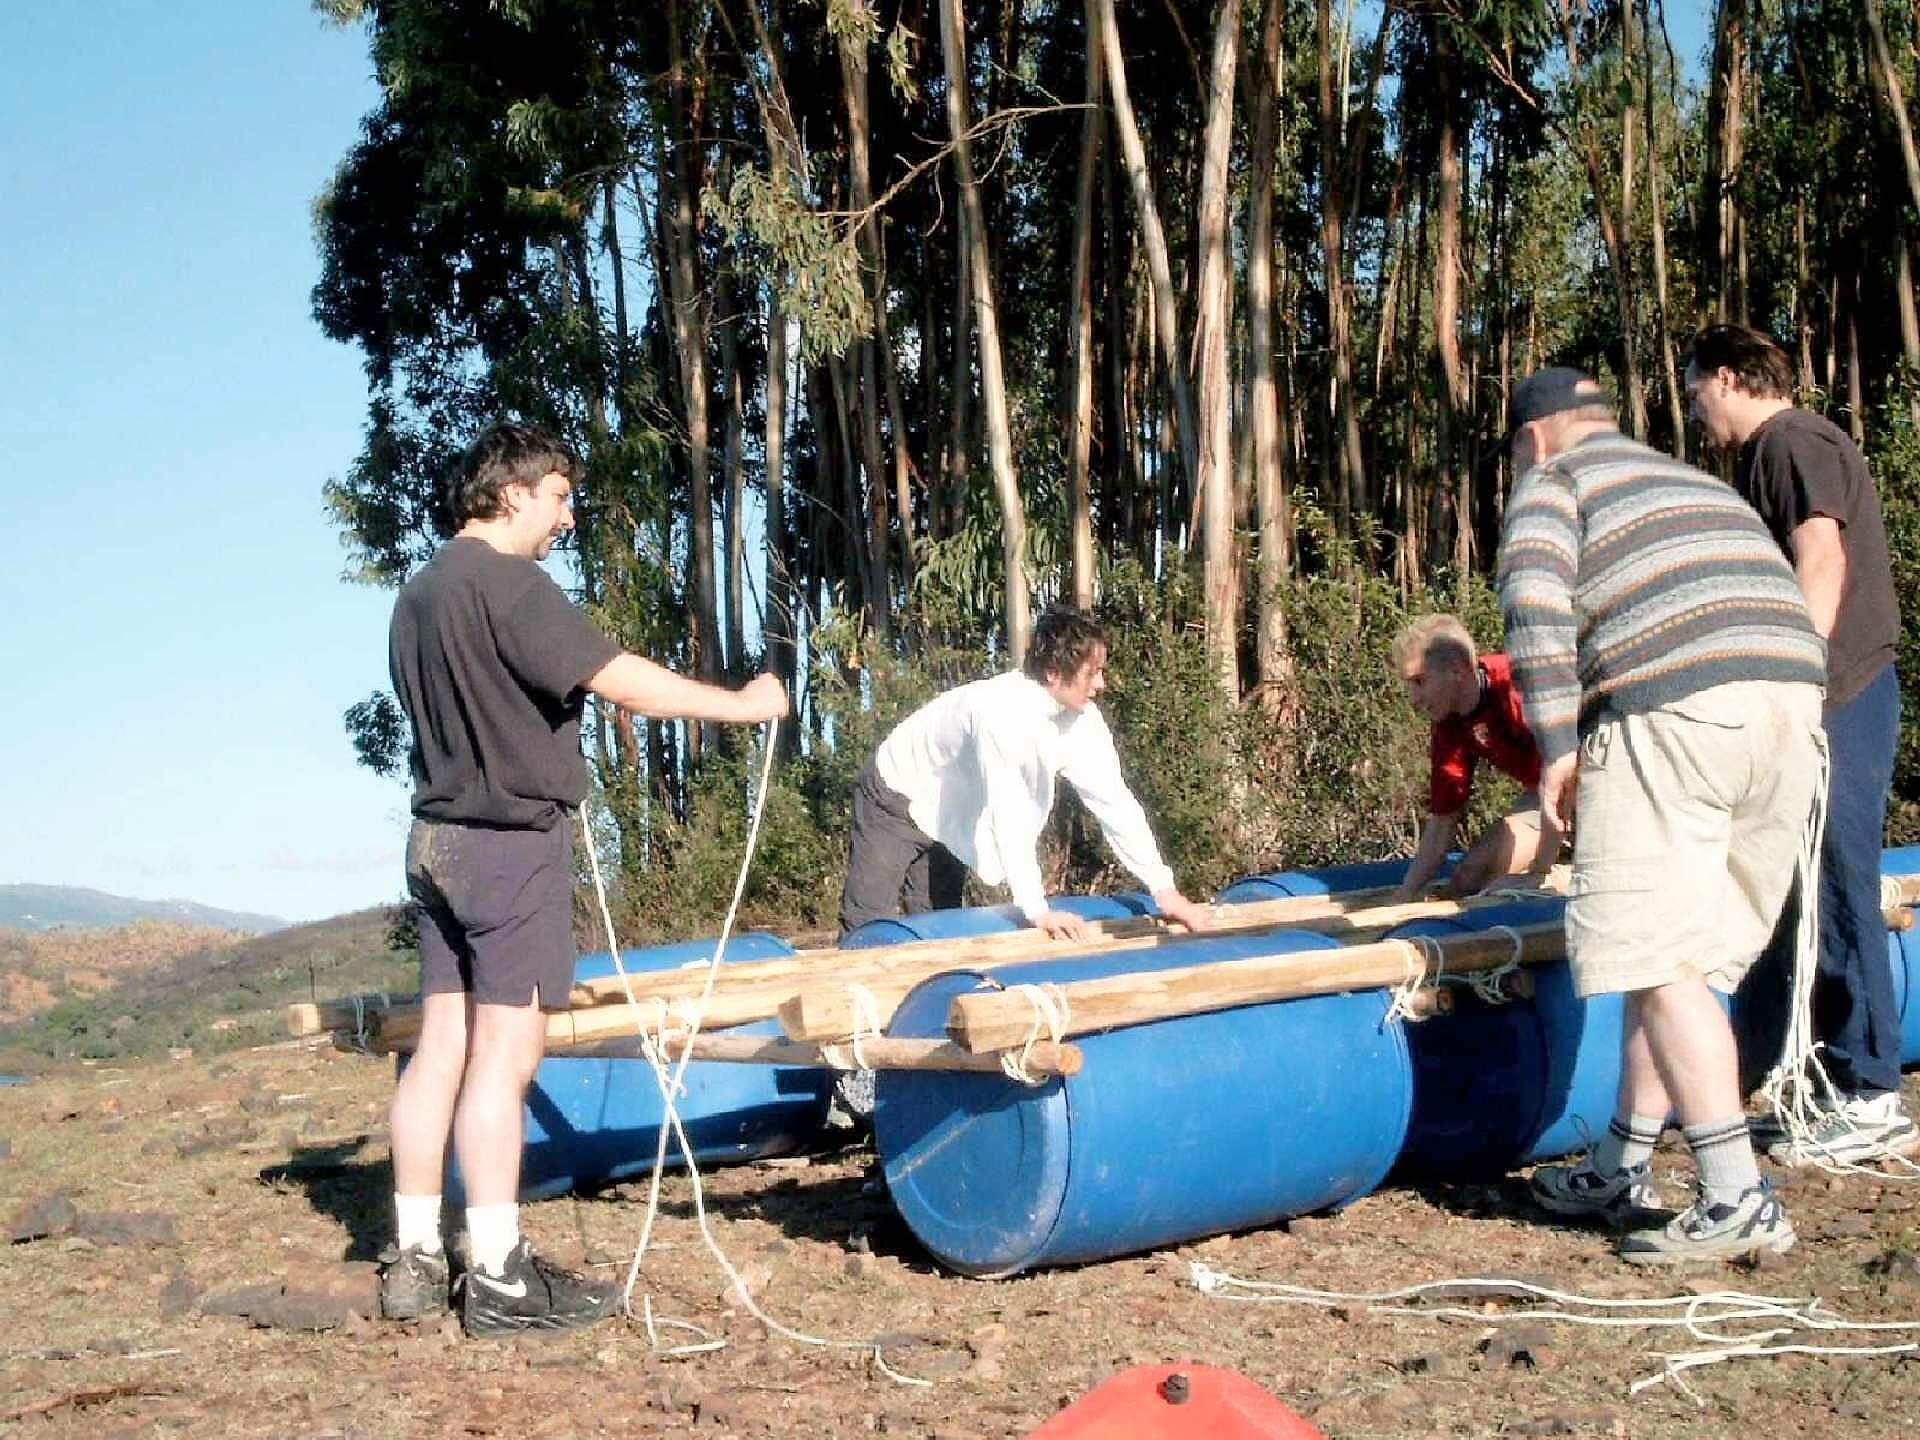 Algarve Floßbau auf See mit Führungsübung